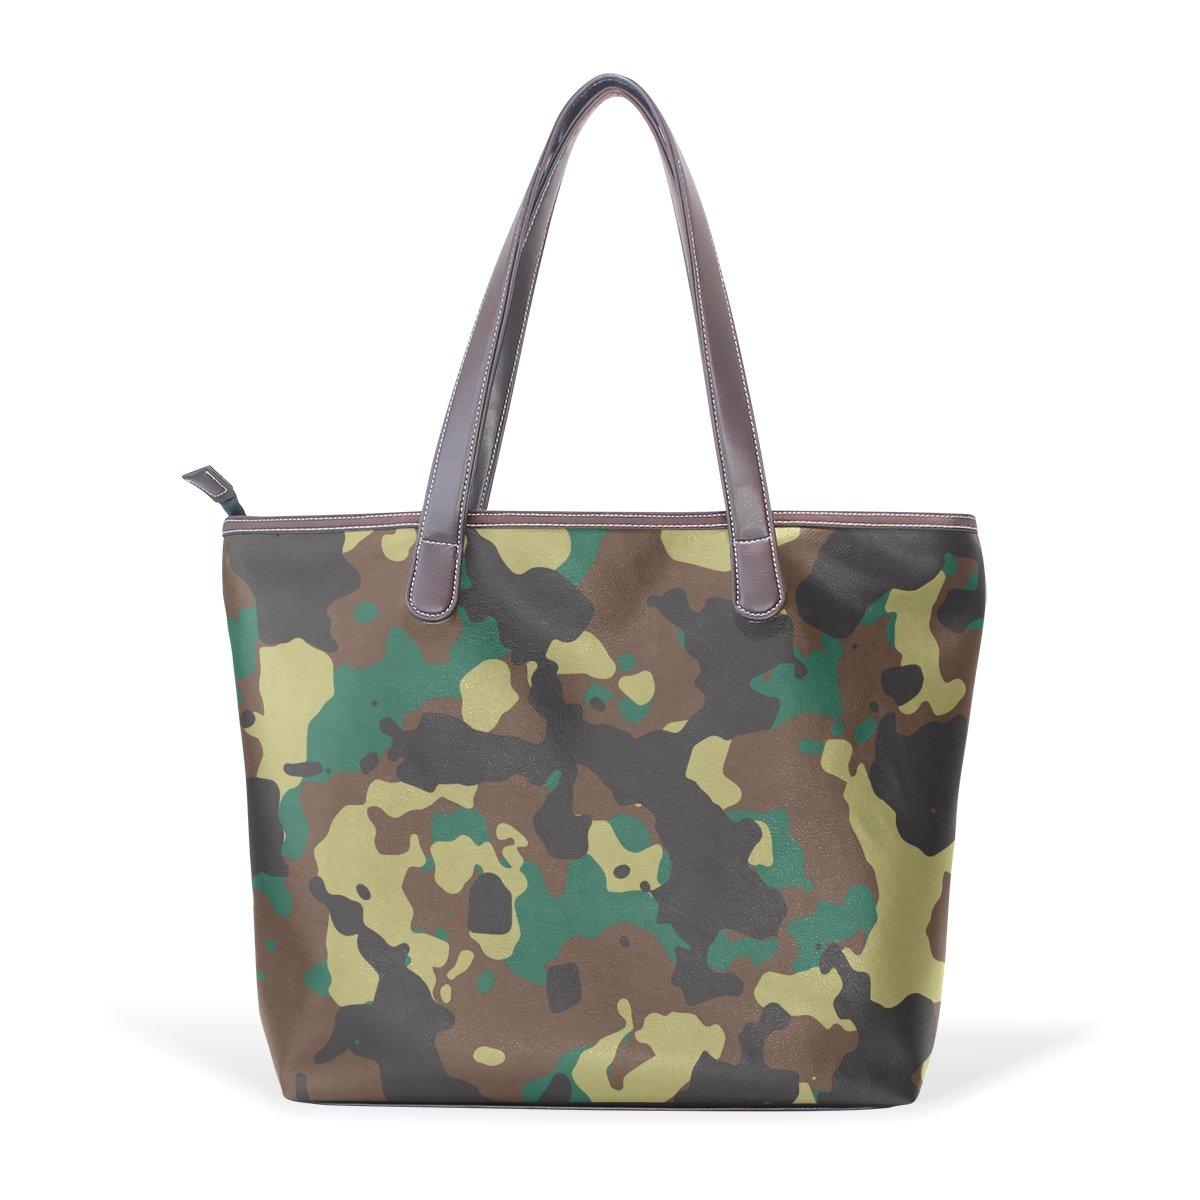 Military Camo Camouflage Pattern Print Womens Fashion Large Shoulder Bag Handbag Tote Purse for Lady